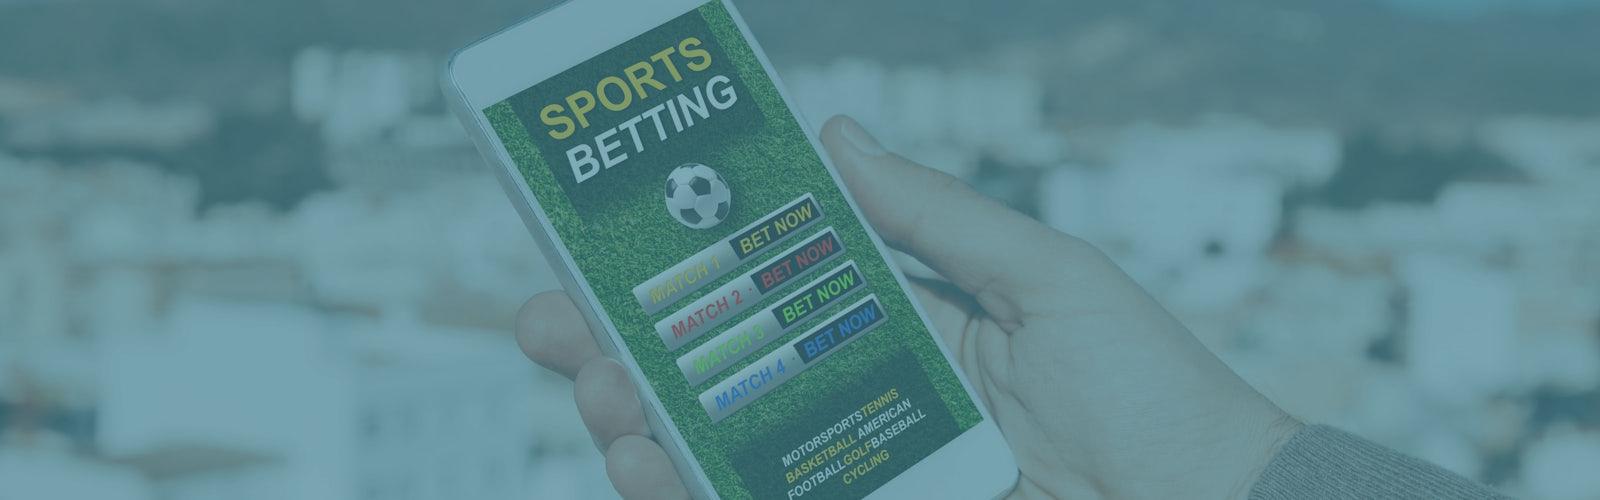 Mobile betting headline image ZA